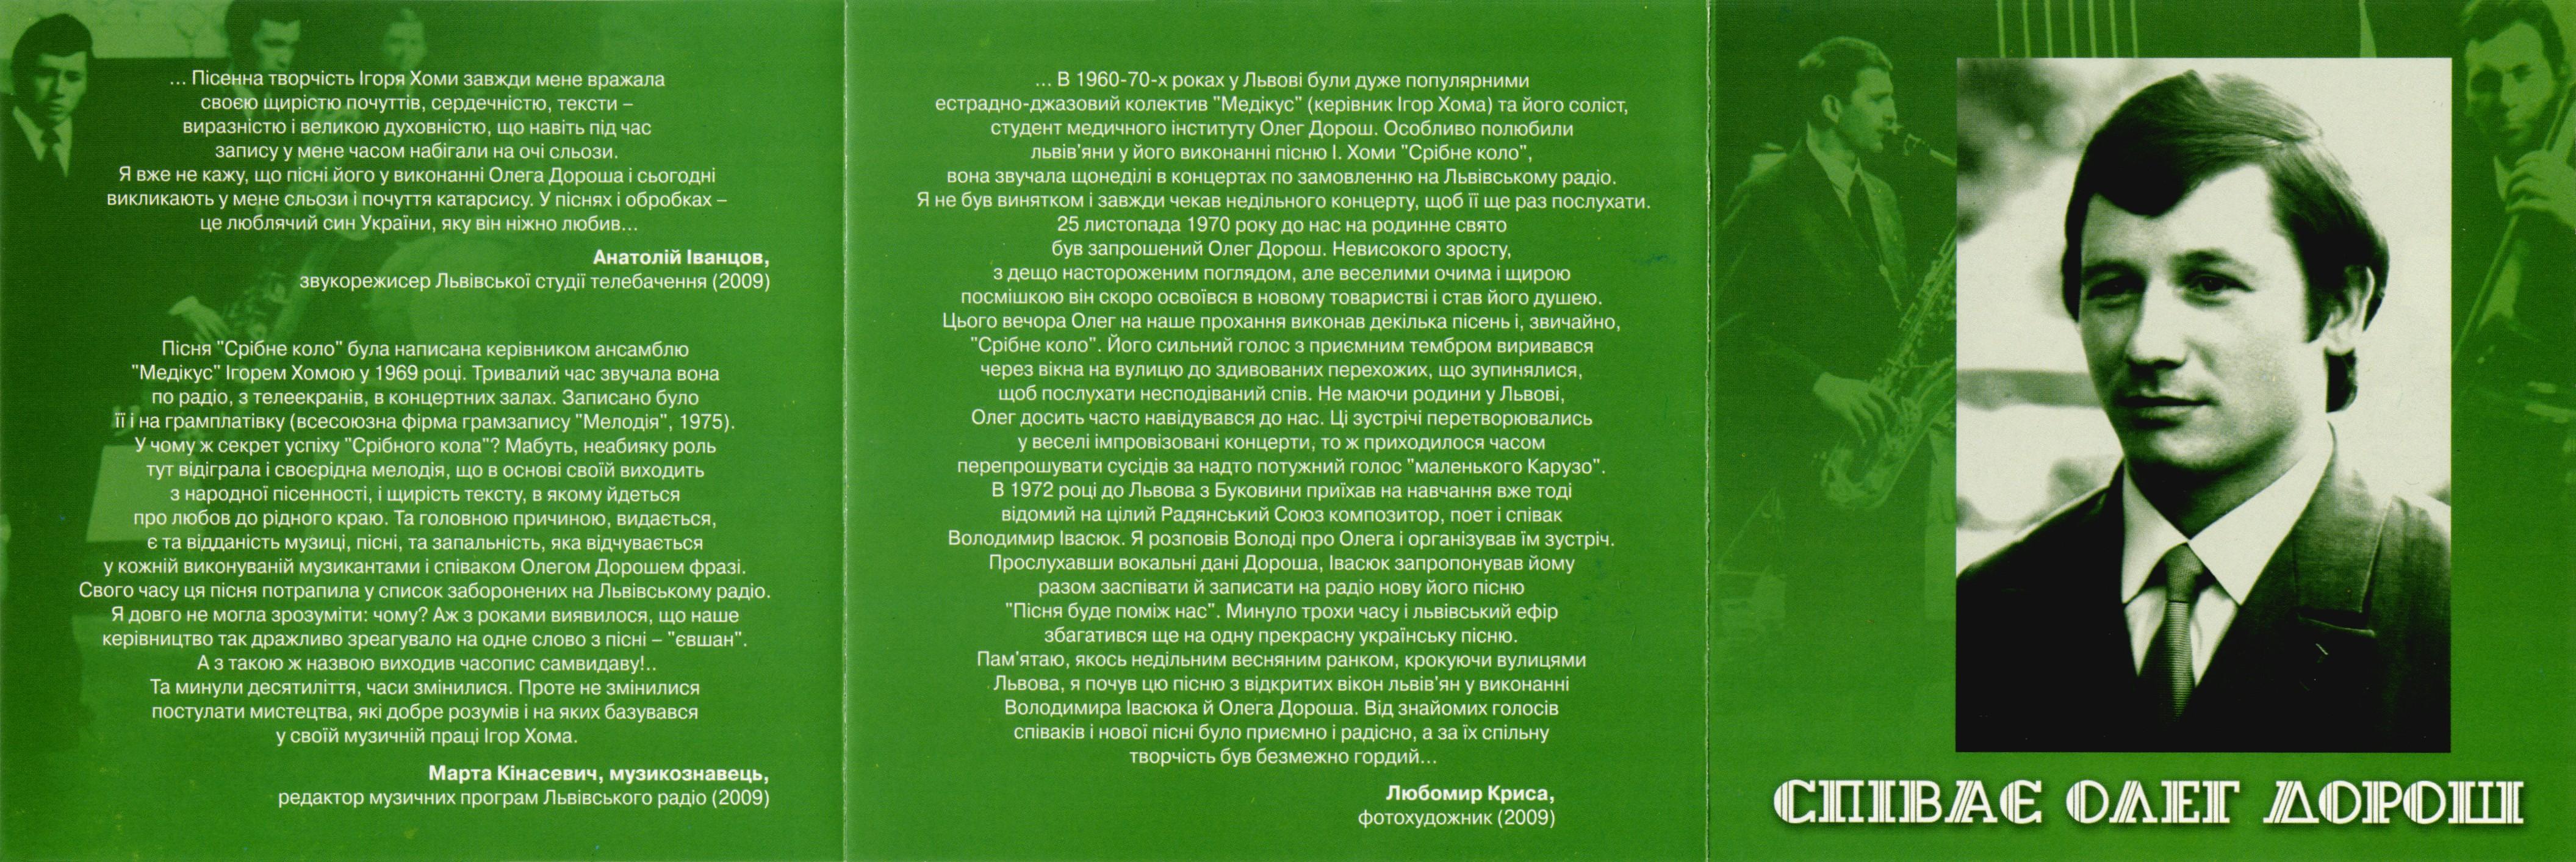 booklet-outside